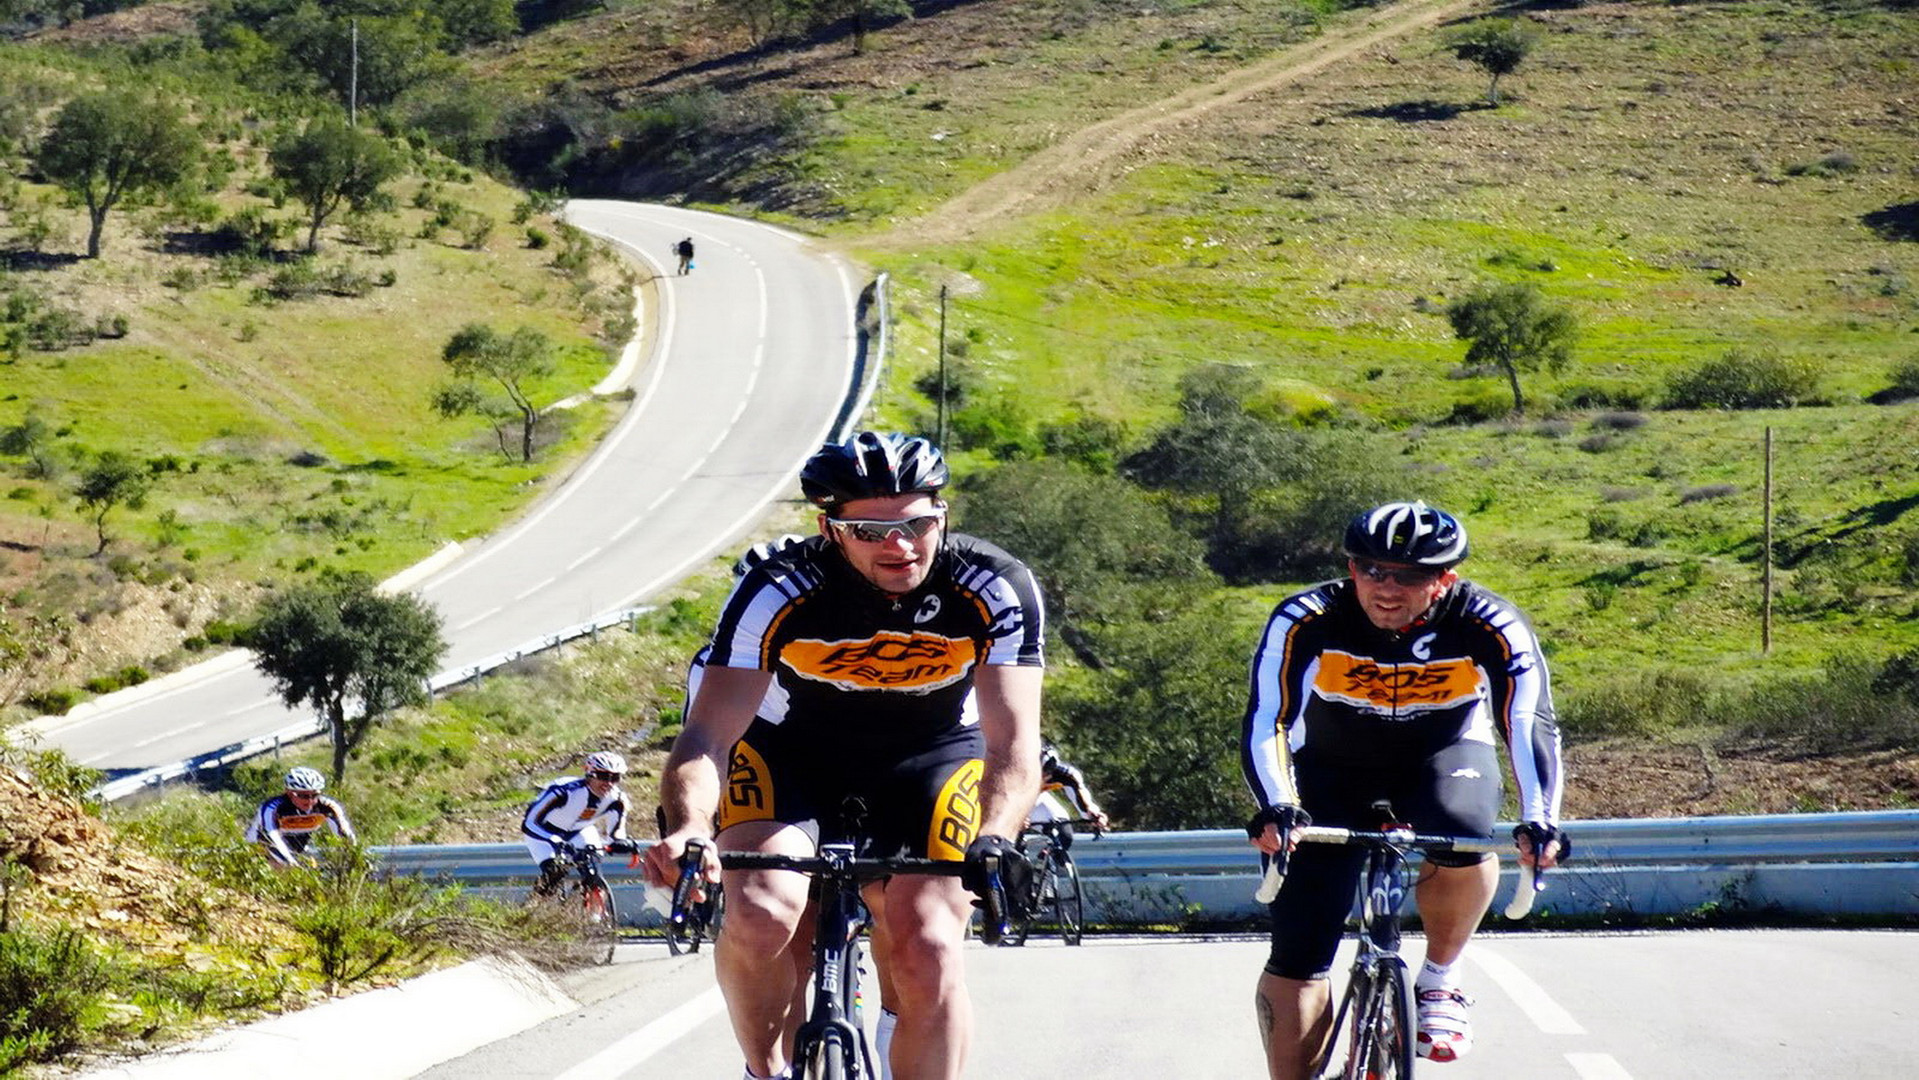 bike-tours-algarve-alg-ale_15.jpg